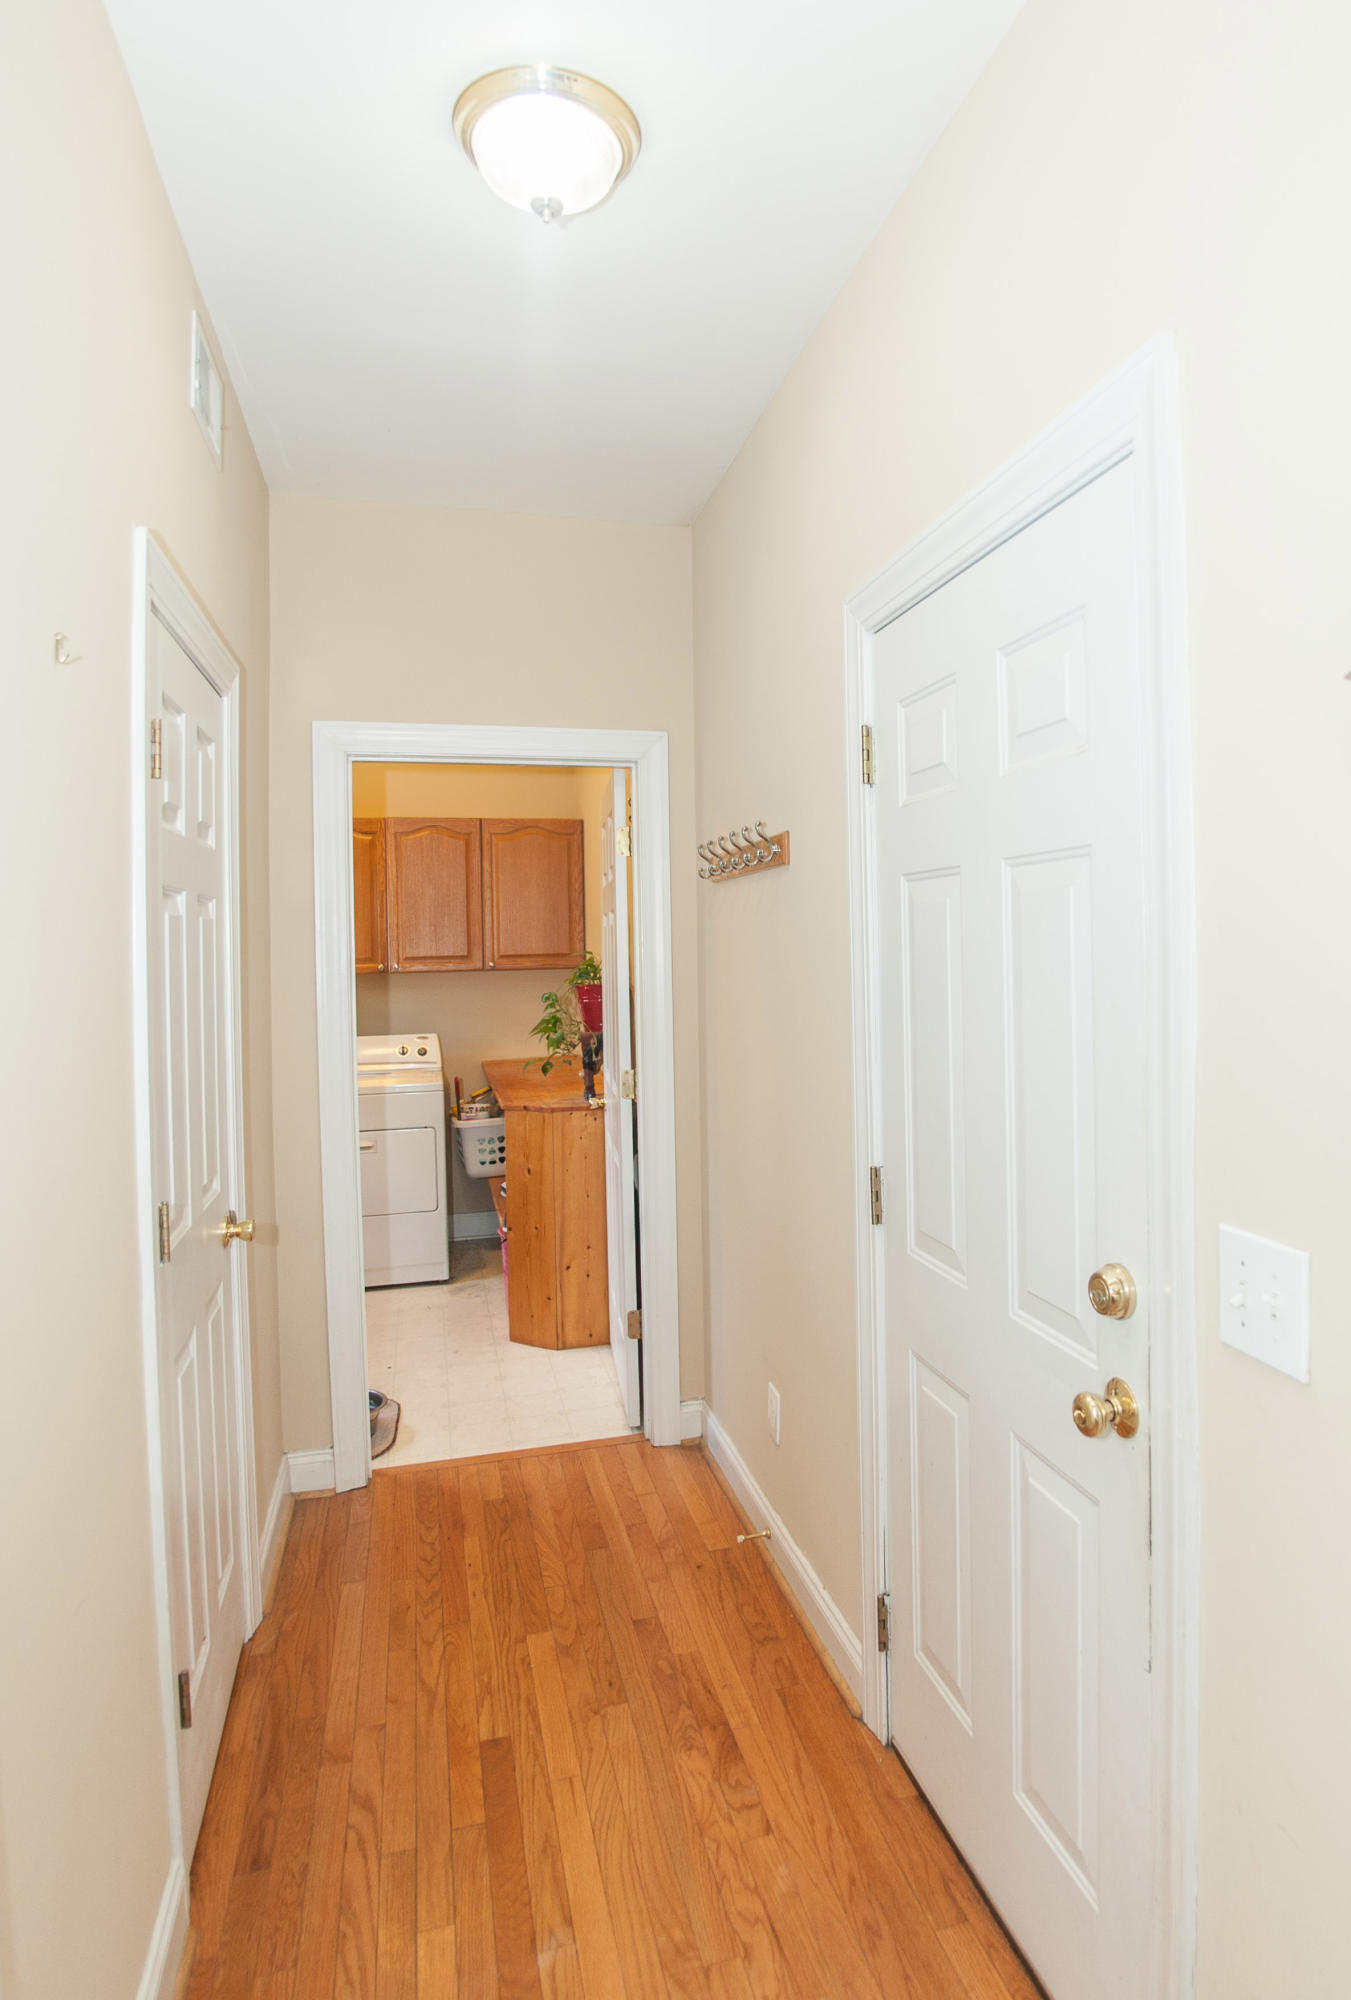 Dunes West Homes For Sale - 2520 Deer Walk, Mount Pleasant, SC - 7